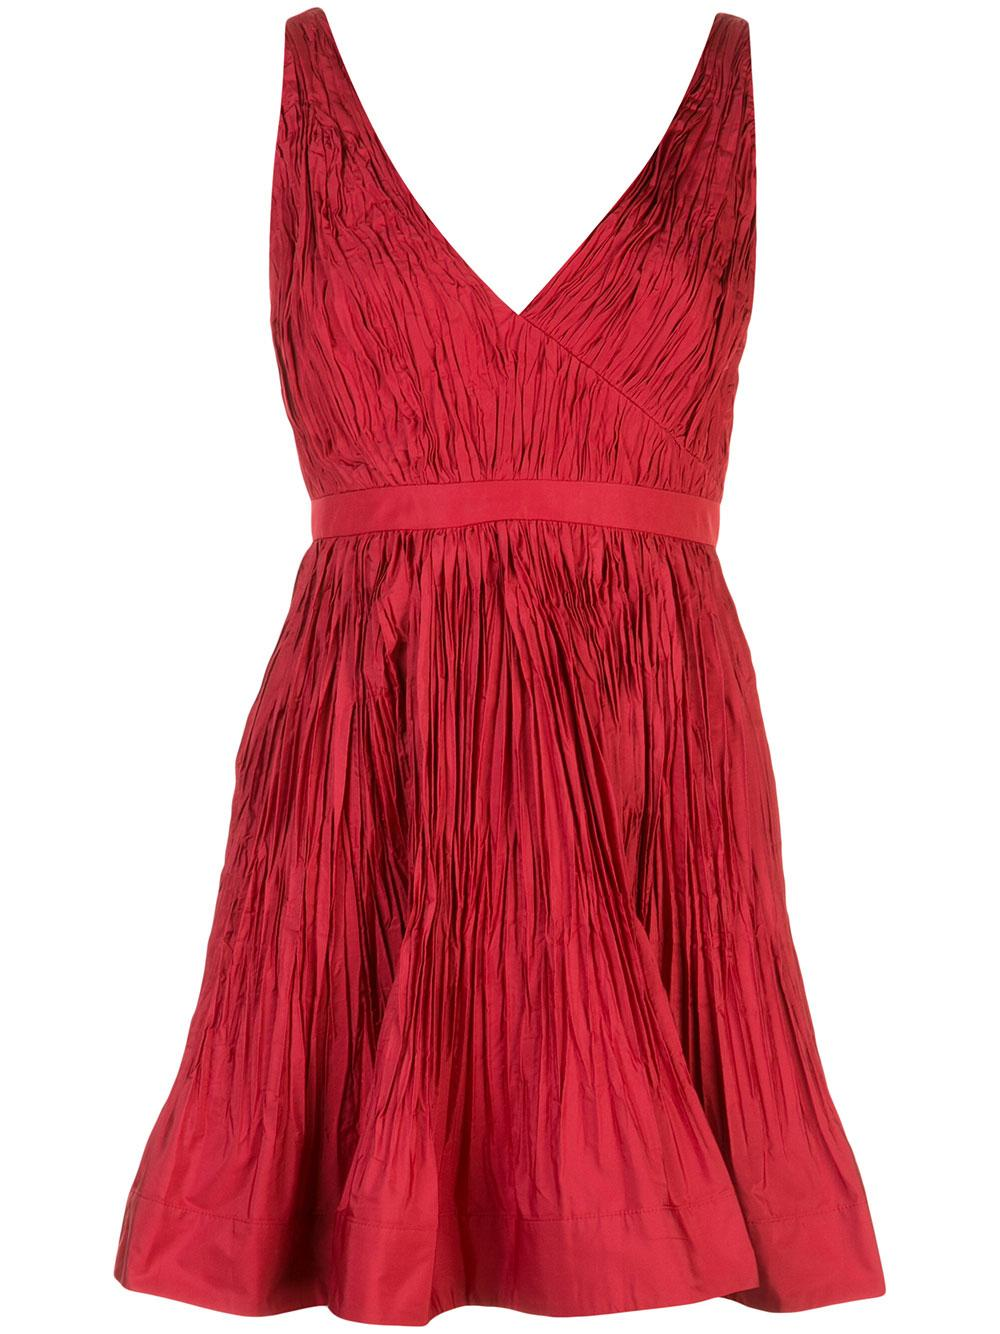 Marilou V- Neck Taffeta Party Dress Item # MARILOU